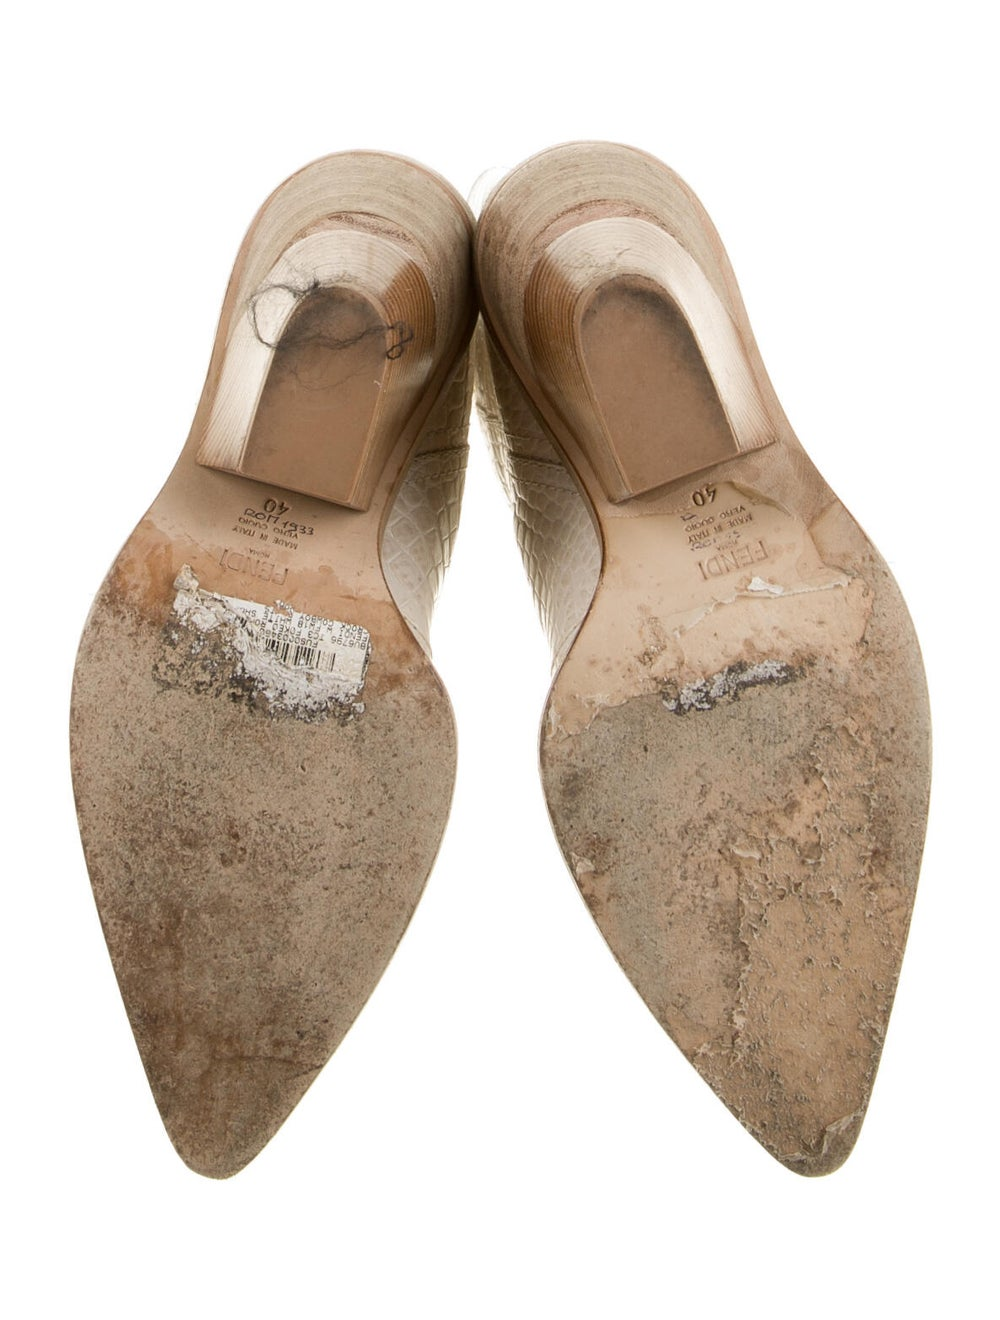 Fendi 2018 2018 Cutwalk Cowboy Embossed Boots Whi… - image 5